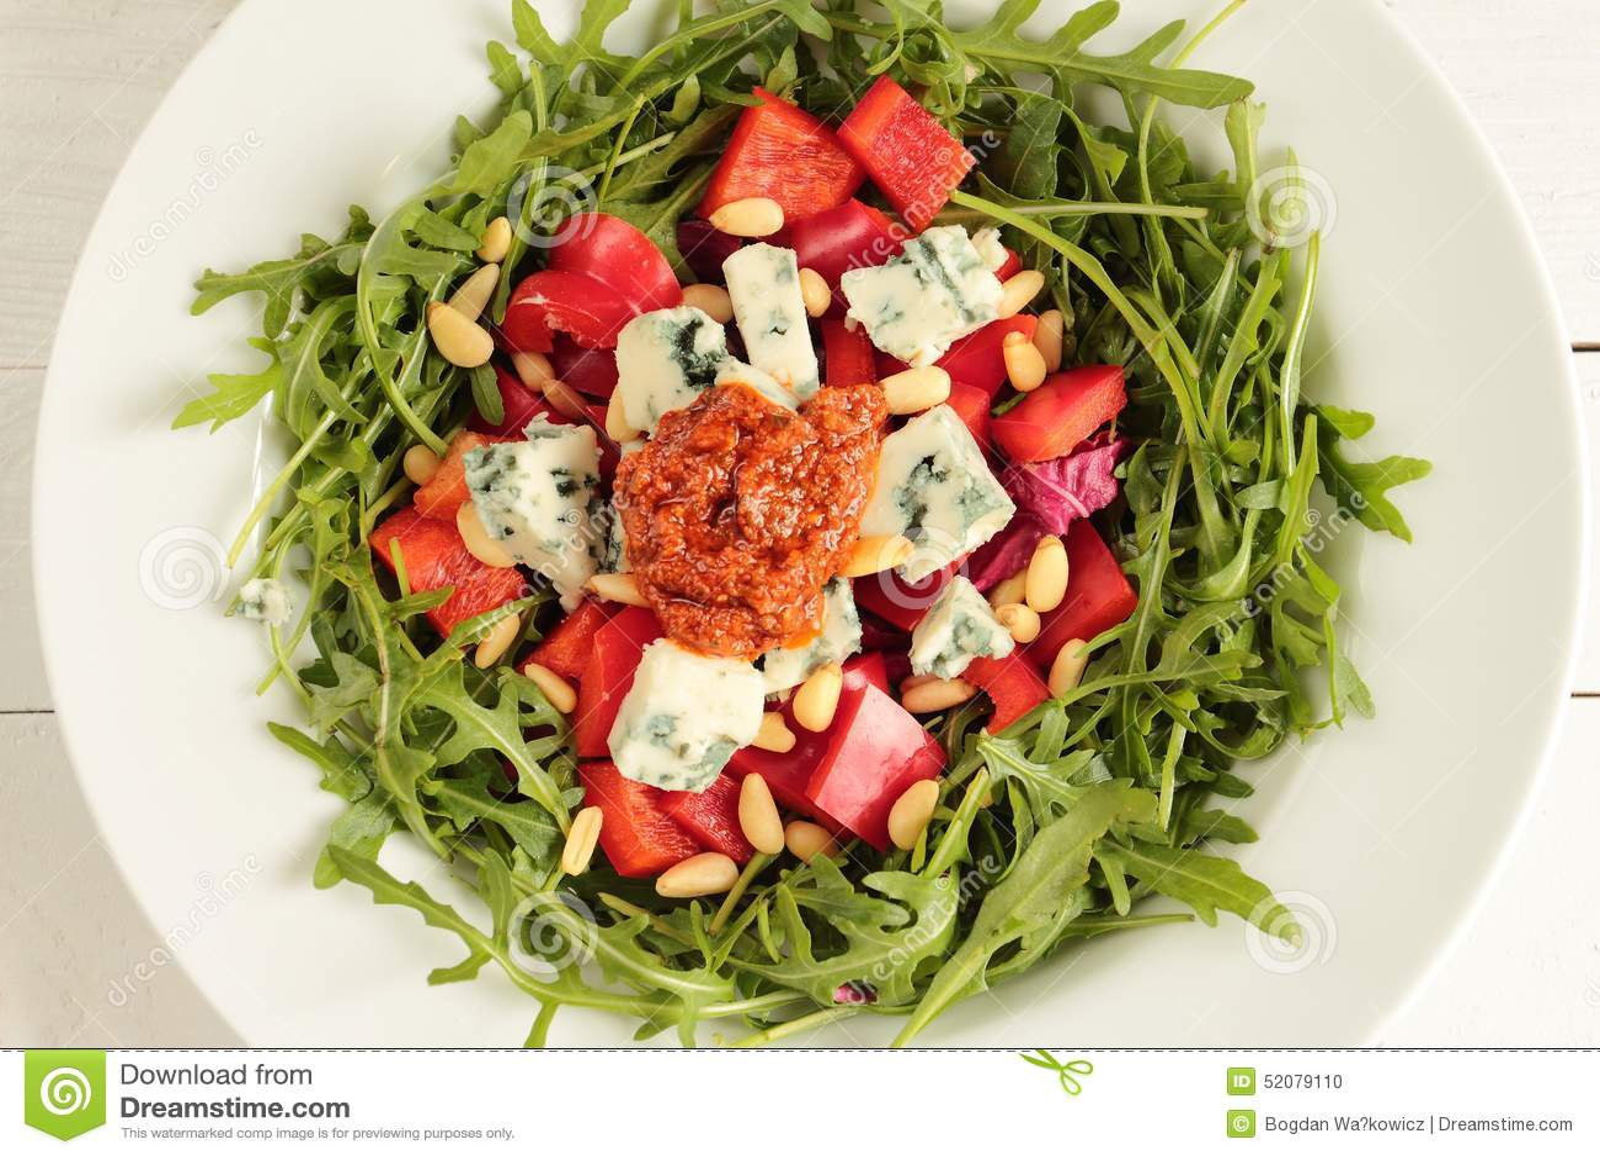 Fresh salad with pesto